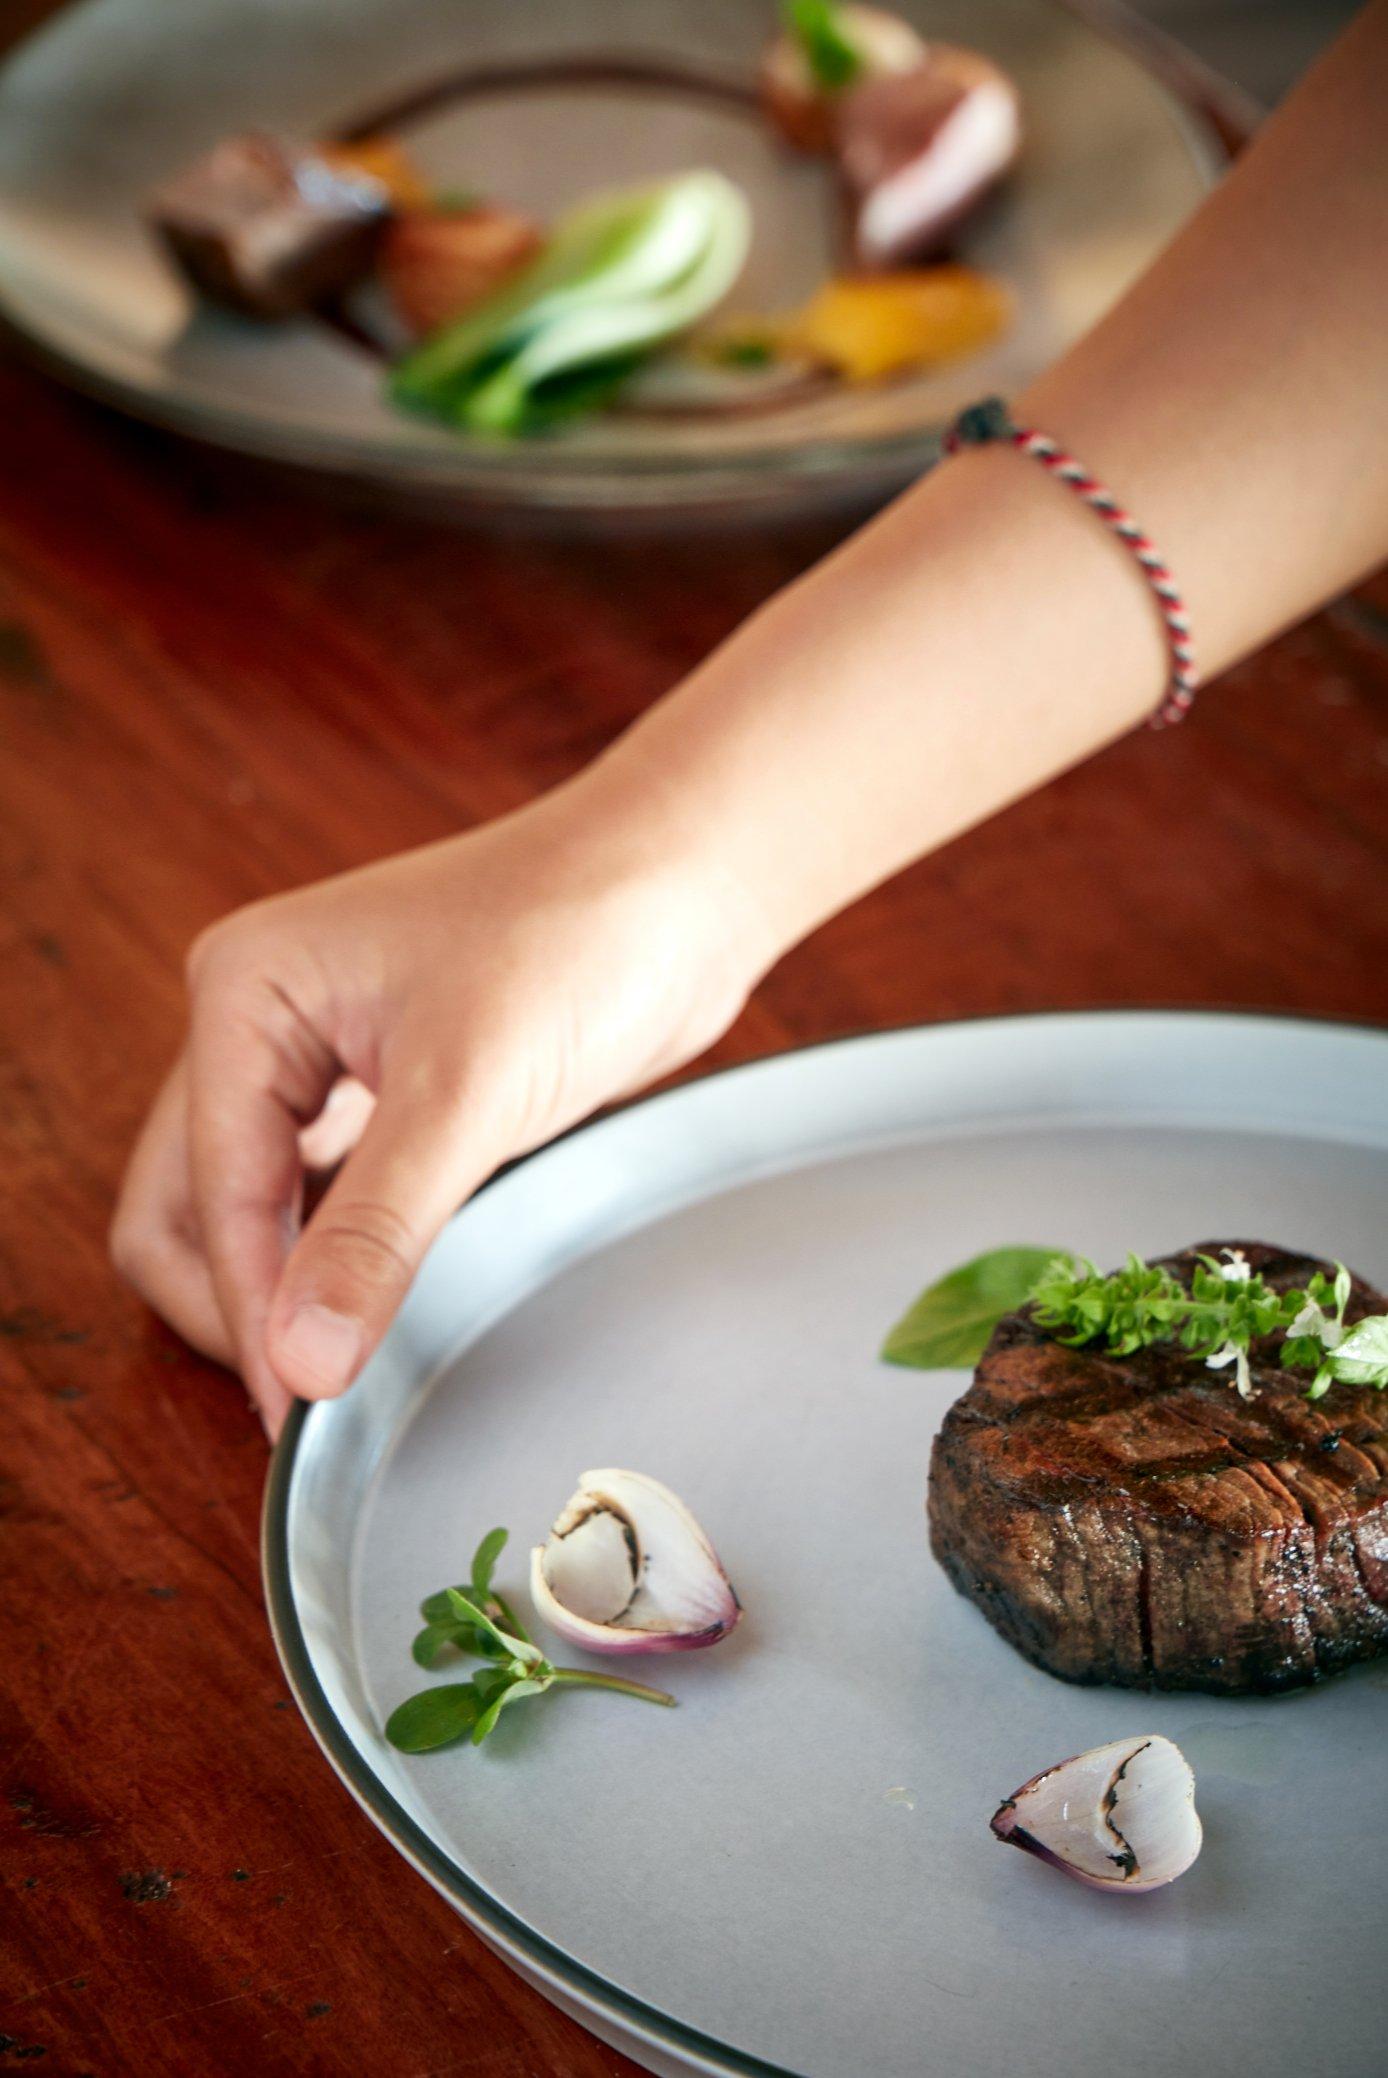 tree-tops-close-up-beef-tendelion-steak-with-onion-garnsh 2